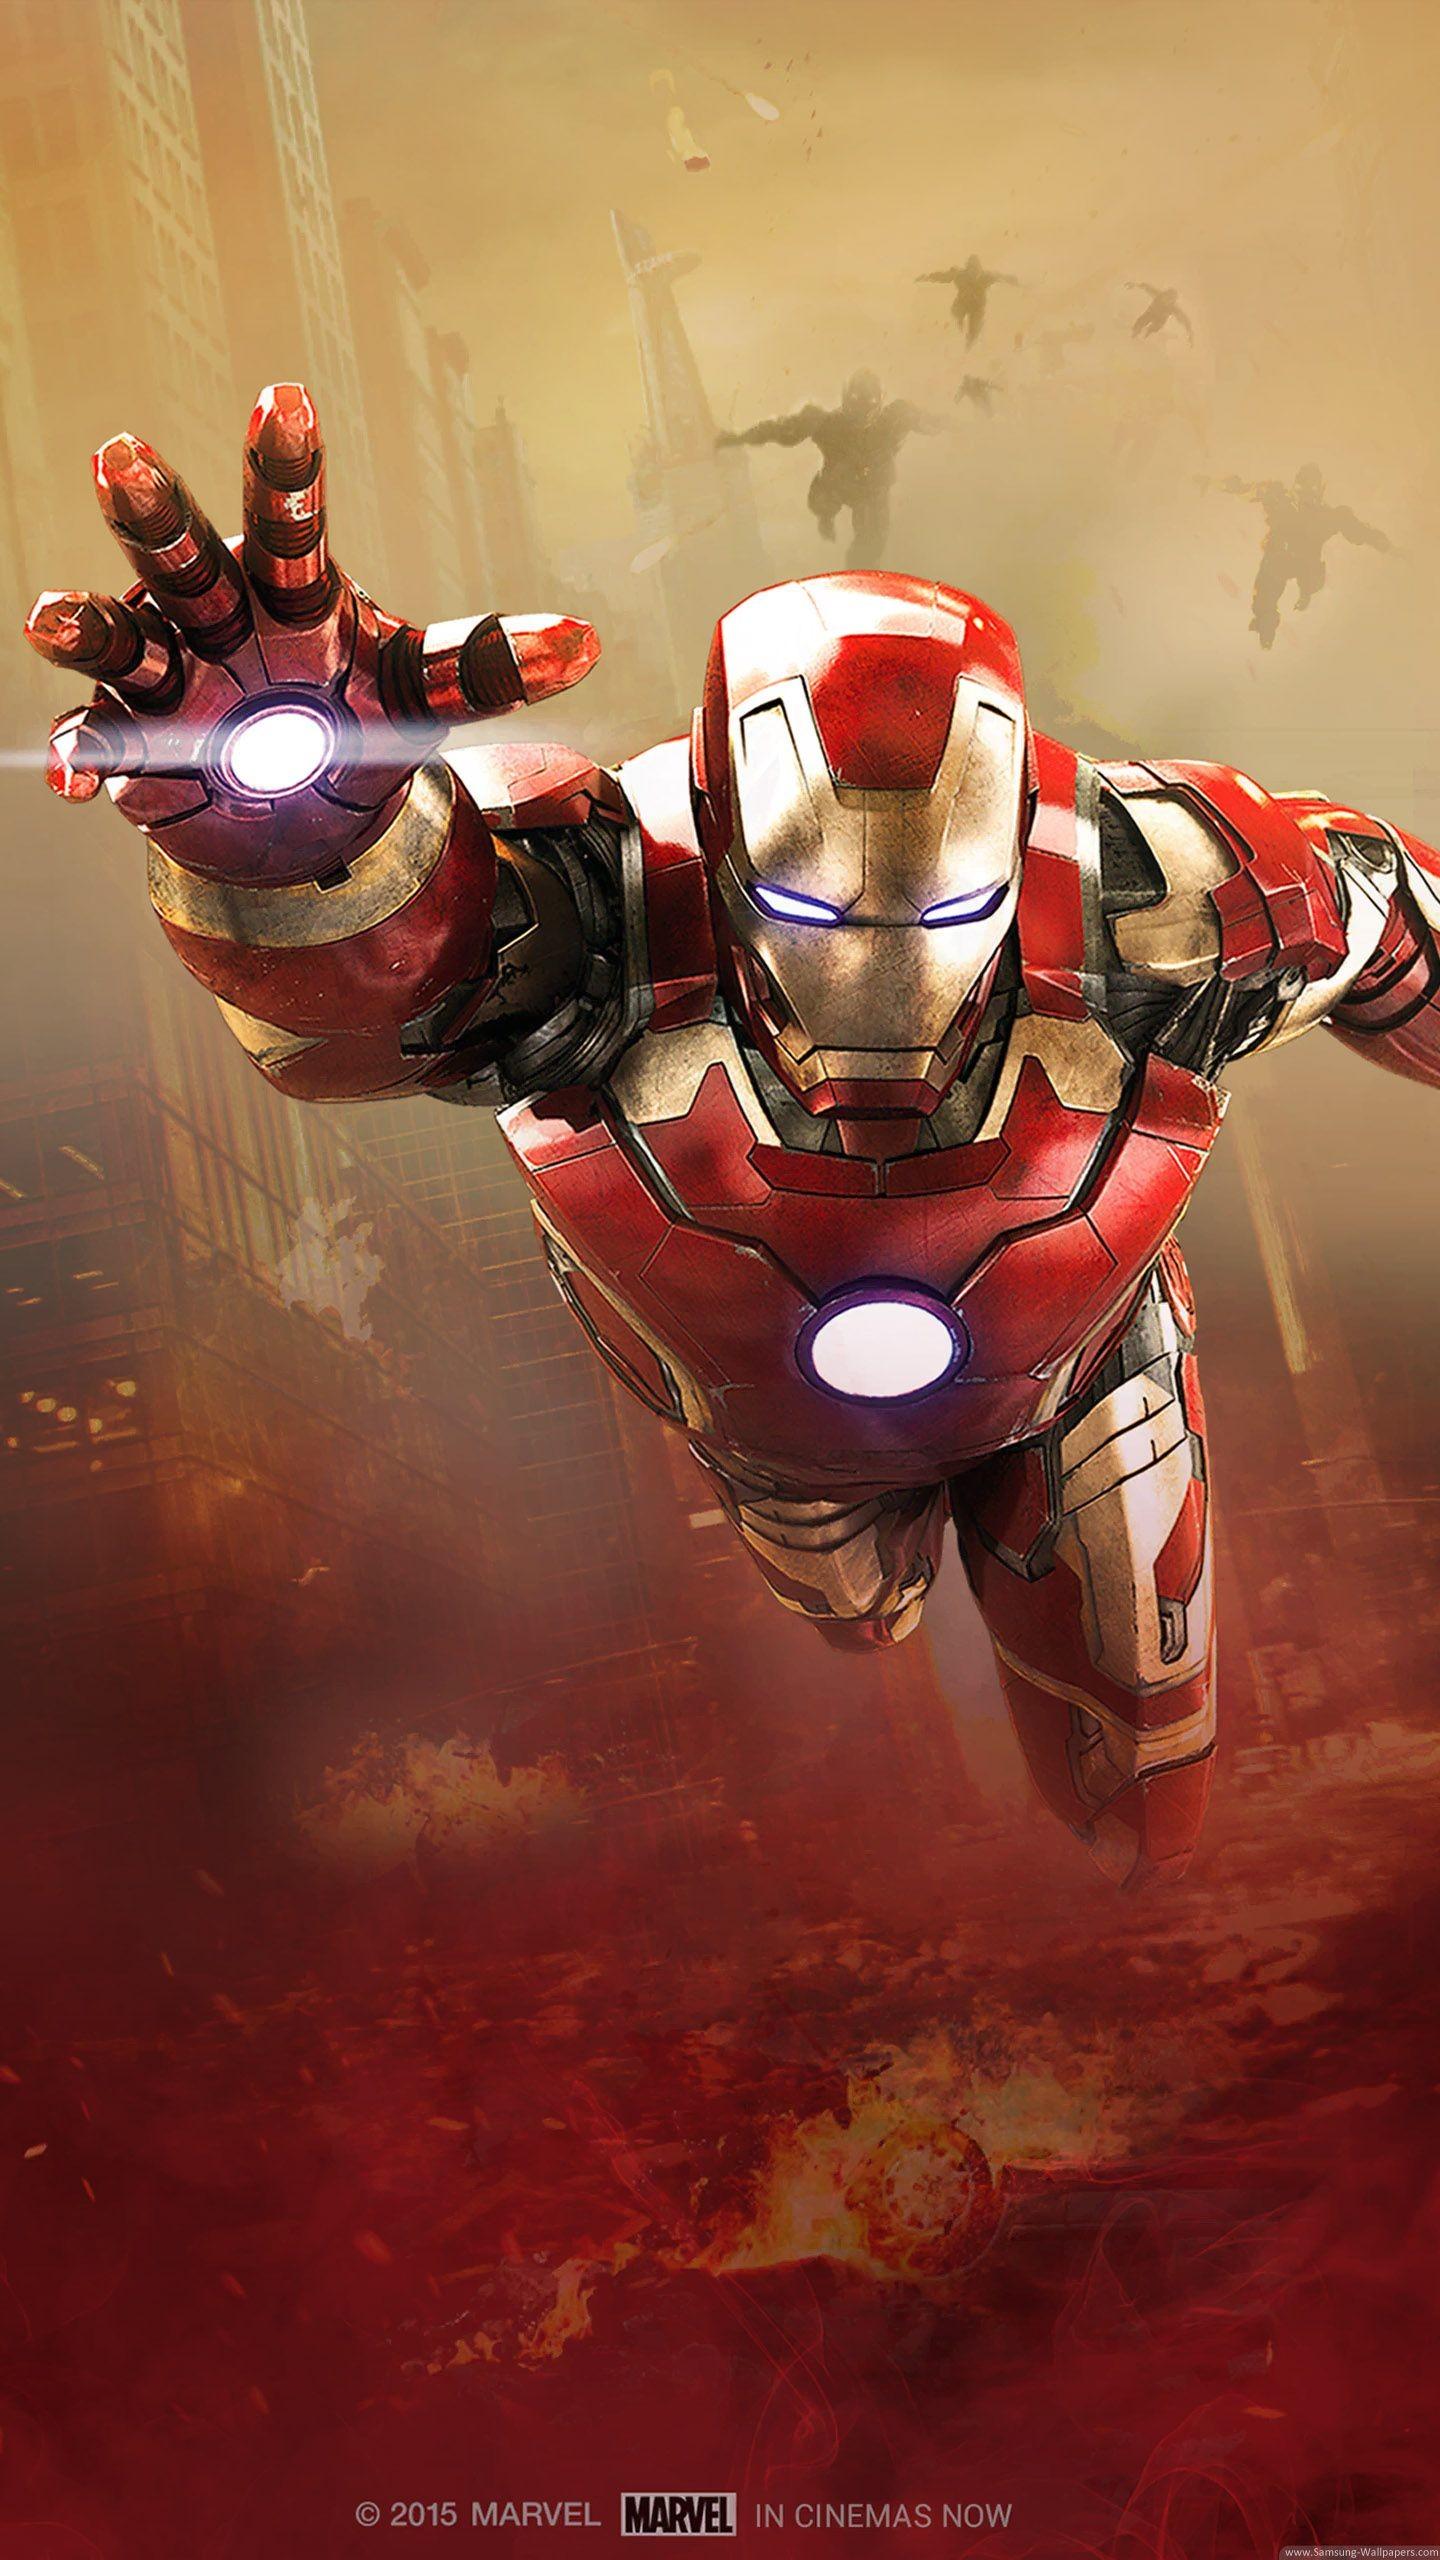 Iron Man Wallpaper iPhone (93+ images)